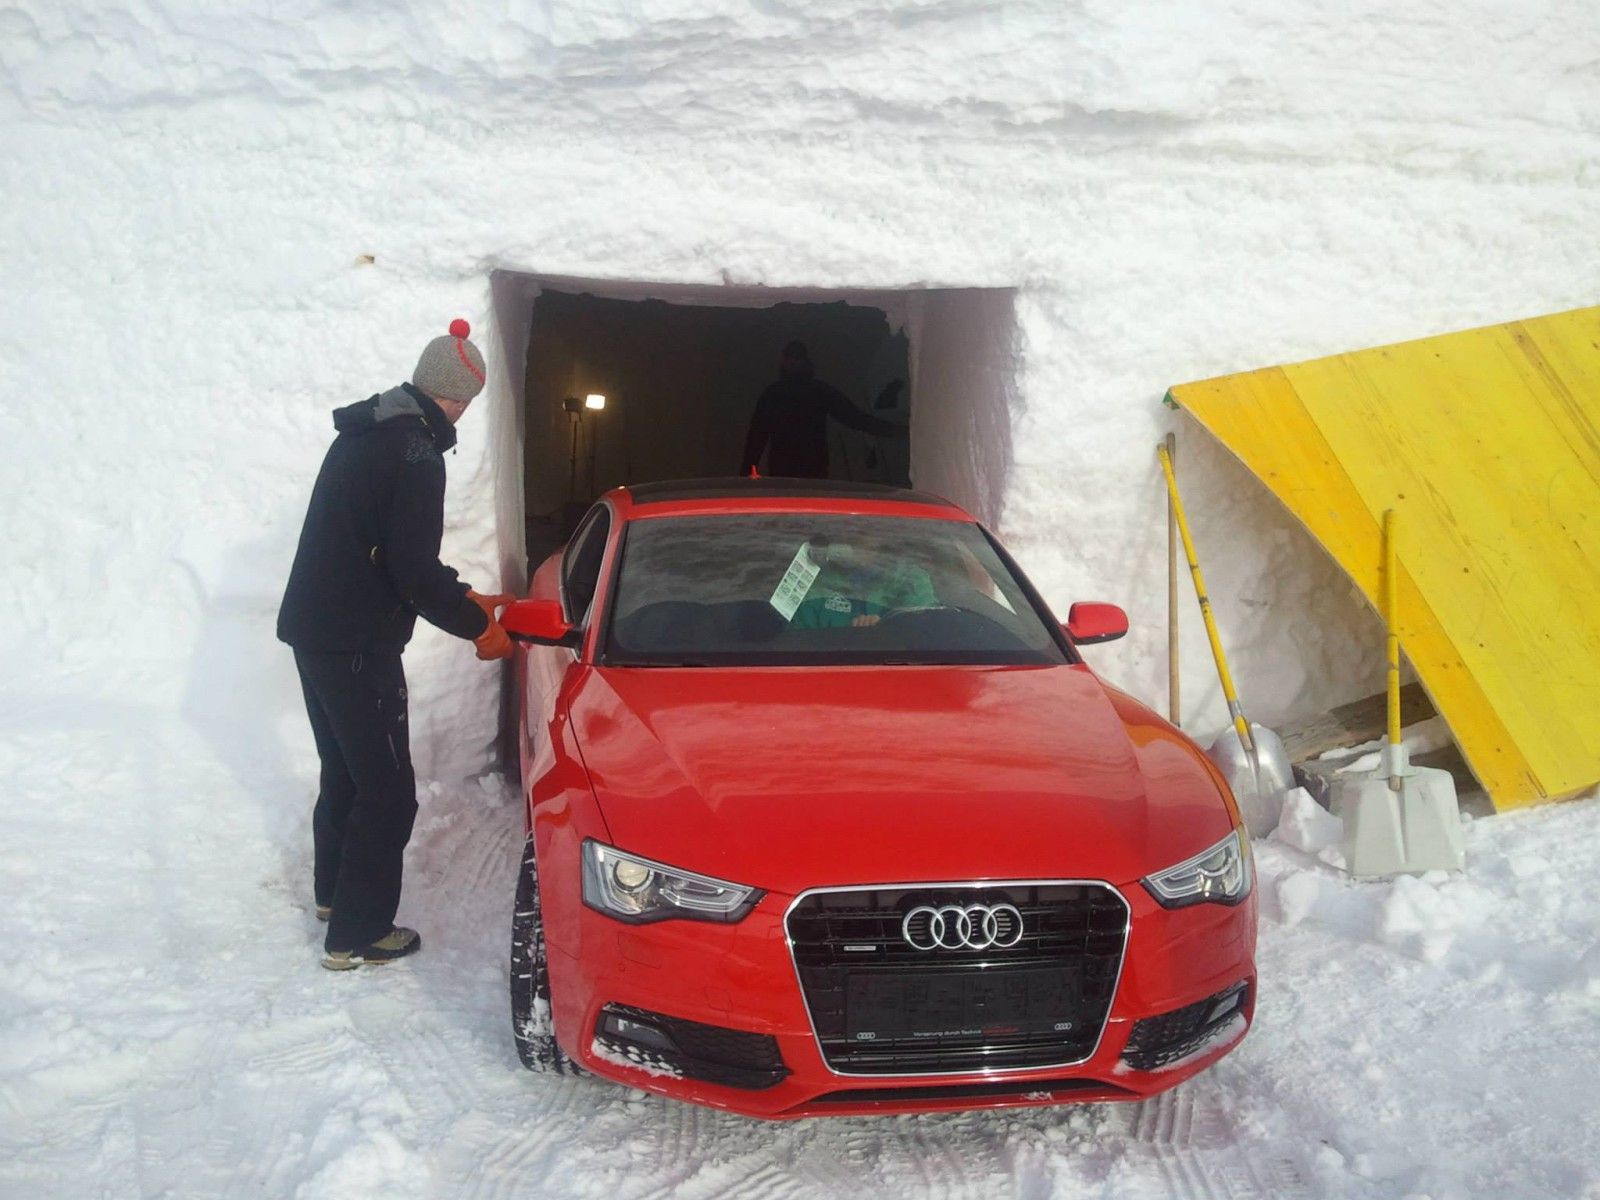 ... kommt der Audi (wenn er durch den Eingang passt)